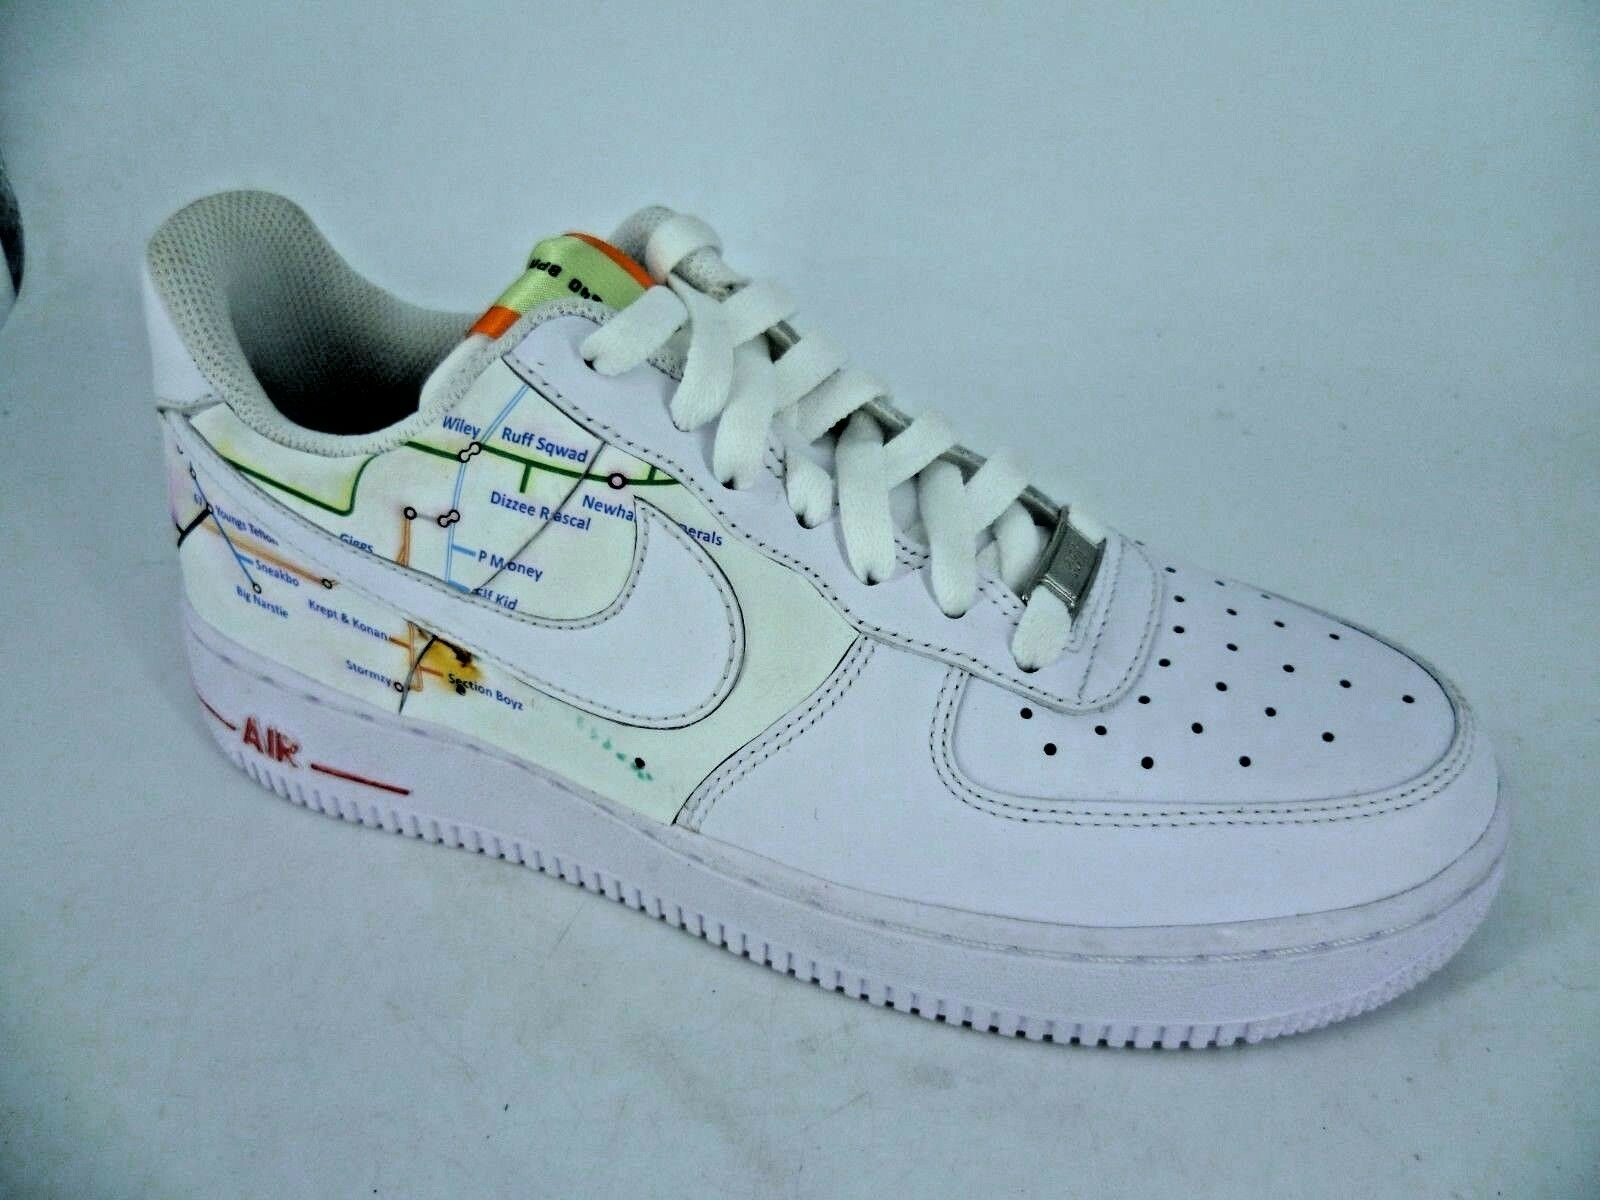 online store 43749 b652d Moyenne Feet personnalisé Baskets Nike Air Force 1 Blanc Baskets  personnalisé LN180 QQ 05 8a94a4